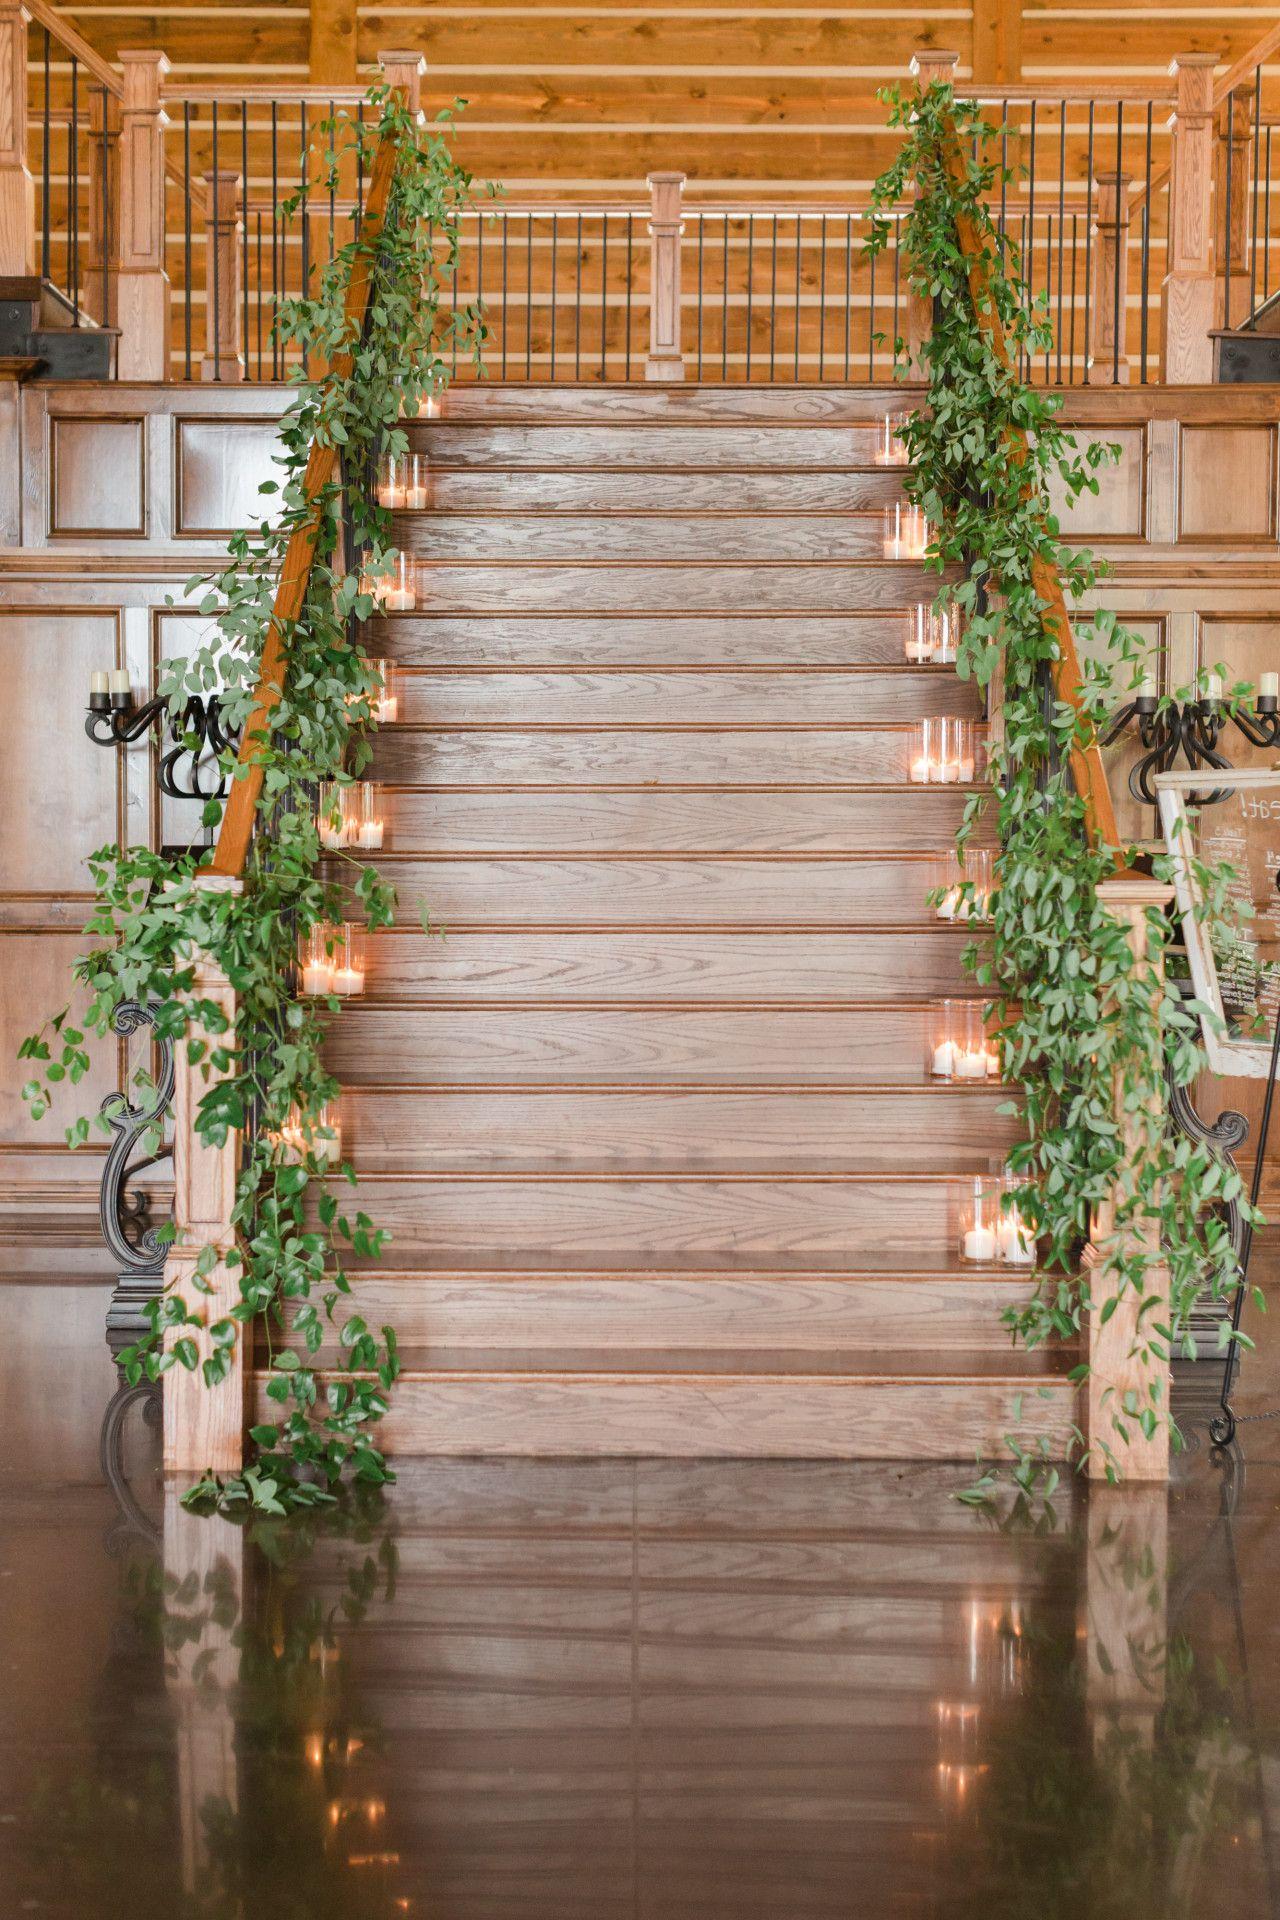 Latest wedding decorations 2018  wedding staircase decor with greenery  candles  elegant wedding